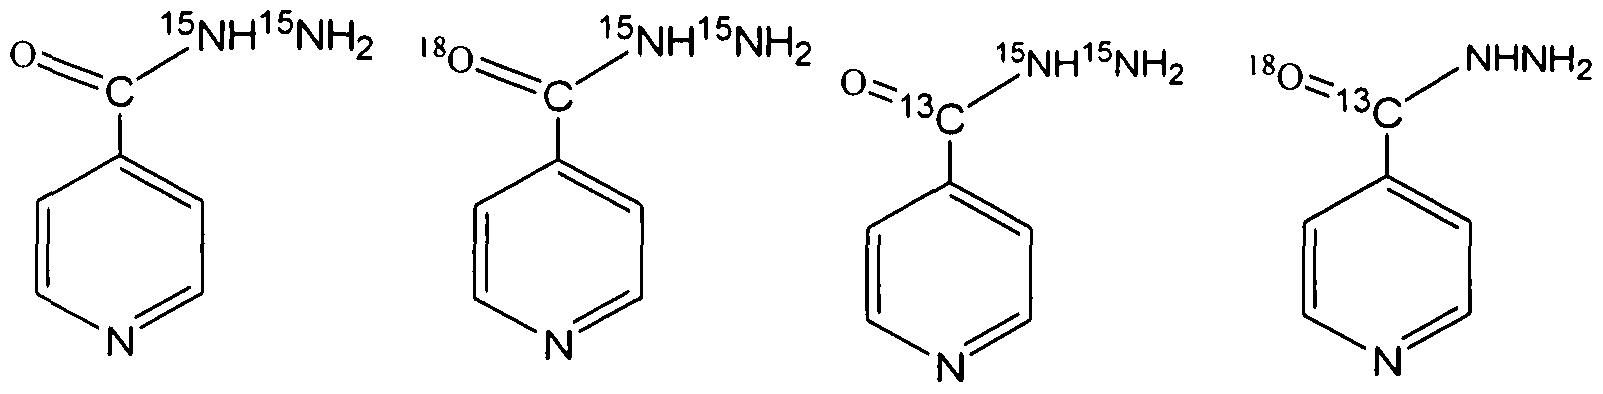 Ethionamide Structure